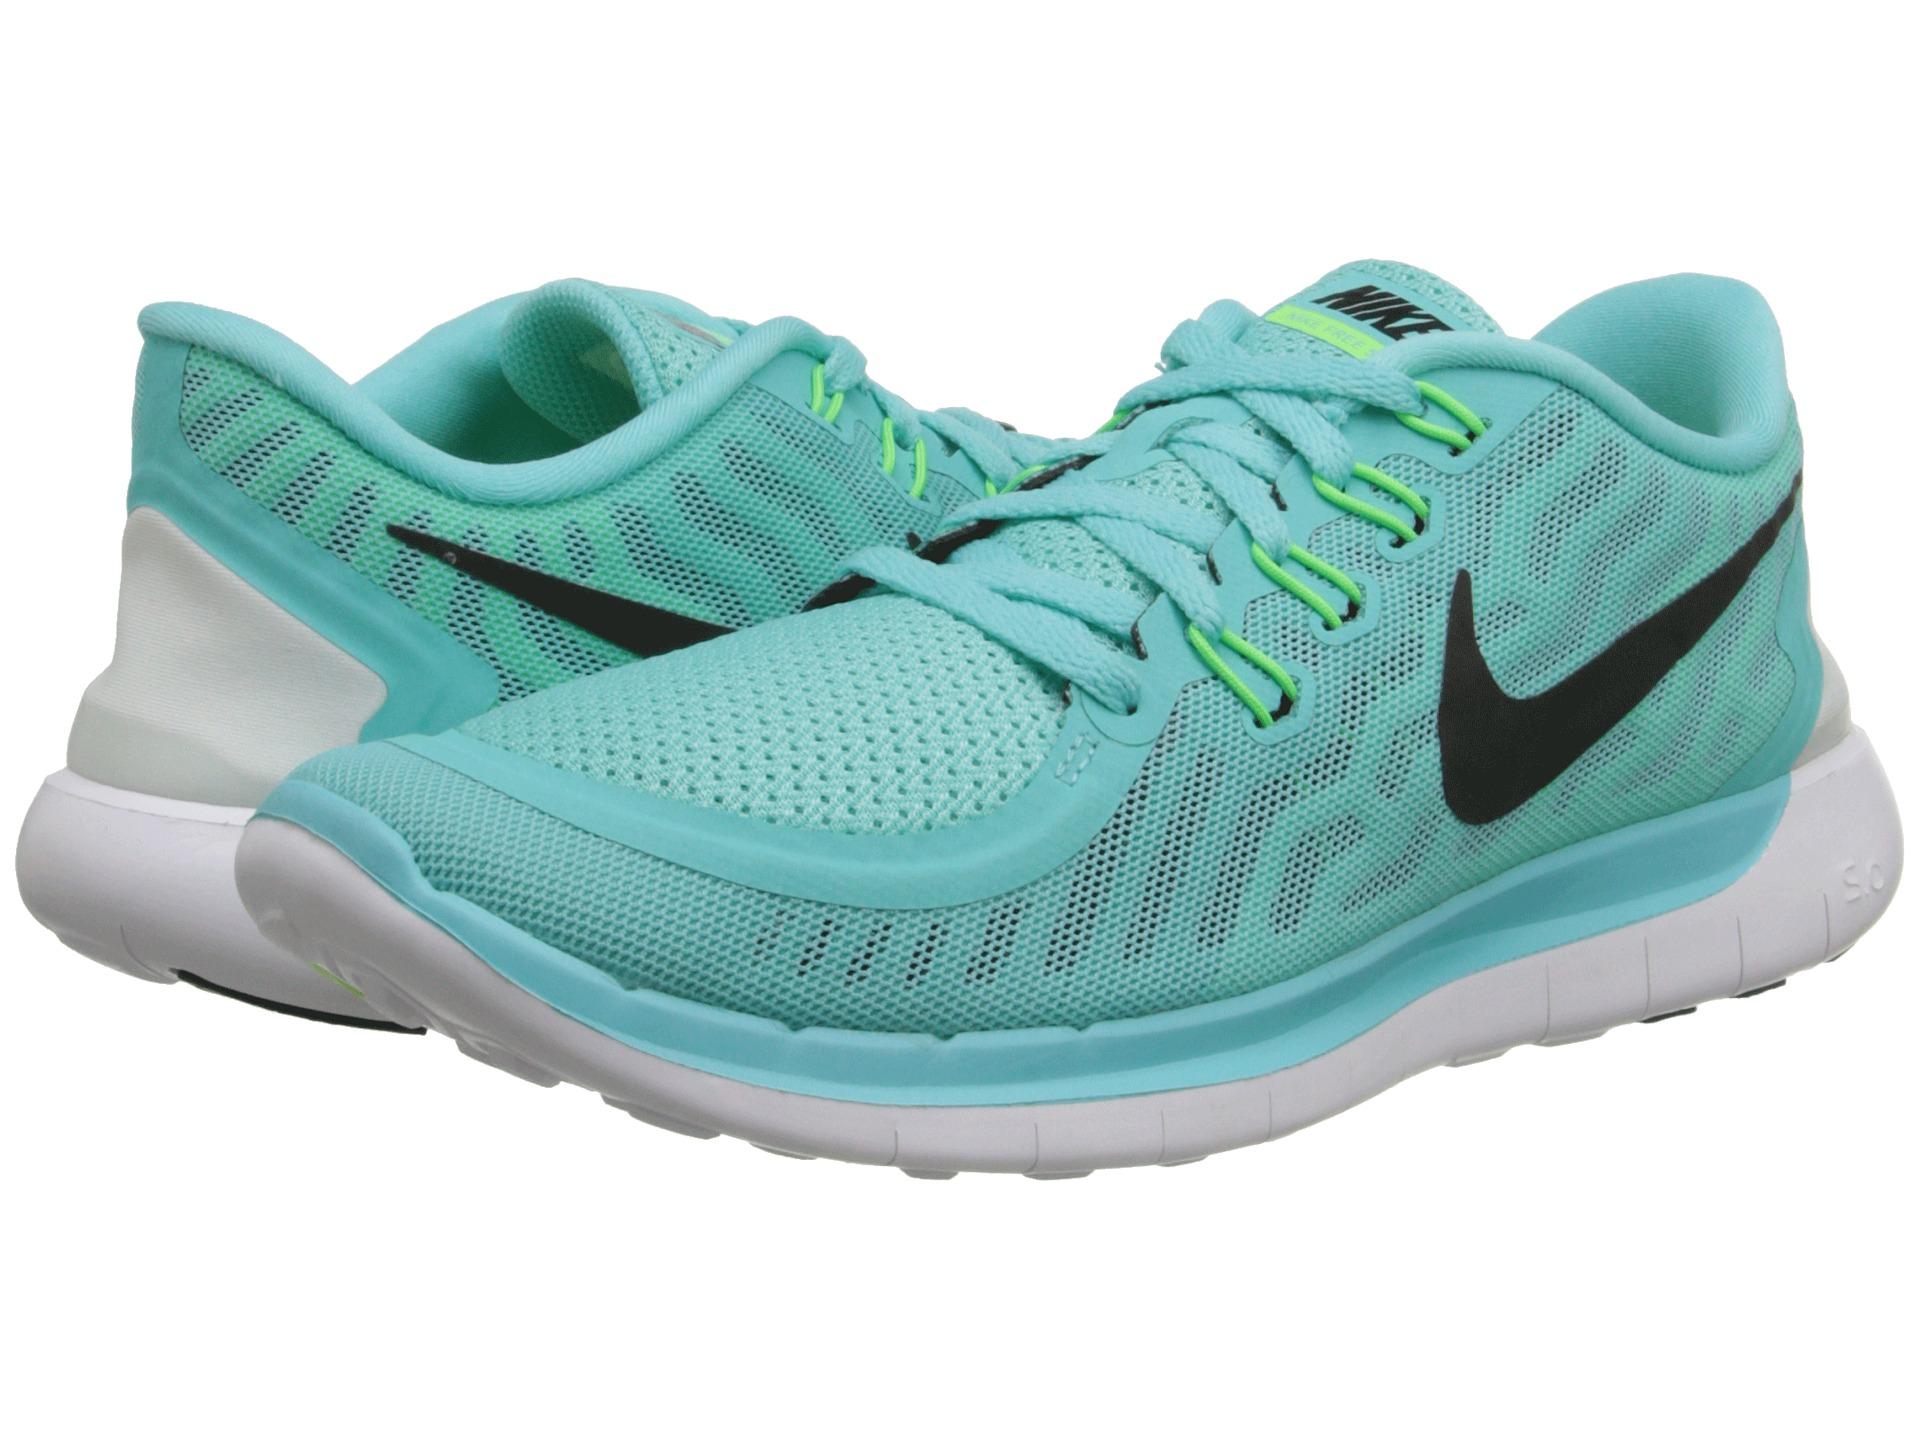 Mint Running Shoes Uk